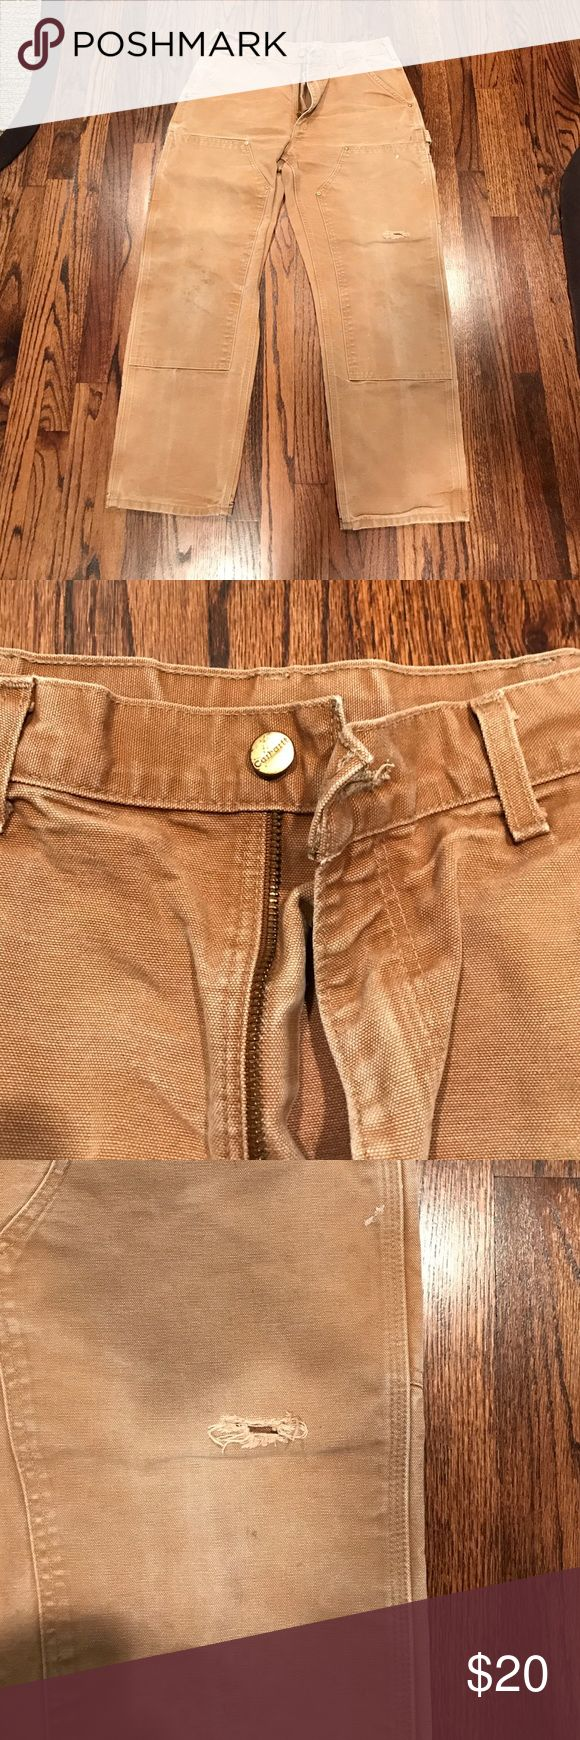 Men's Carhartt work pants Men's genuine Carhartt work pants. Slight rip in the knee, but has been repaired and reinforced. Carhartt Pants Cargo